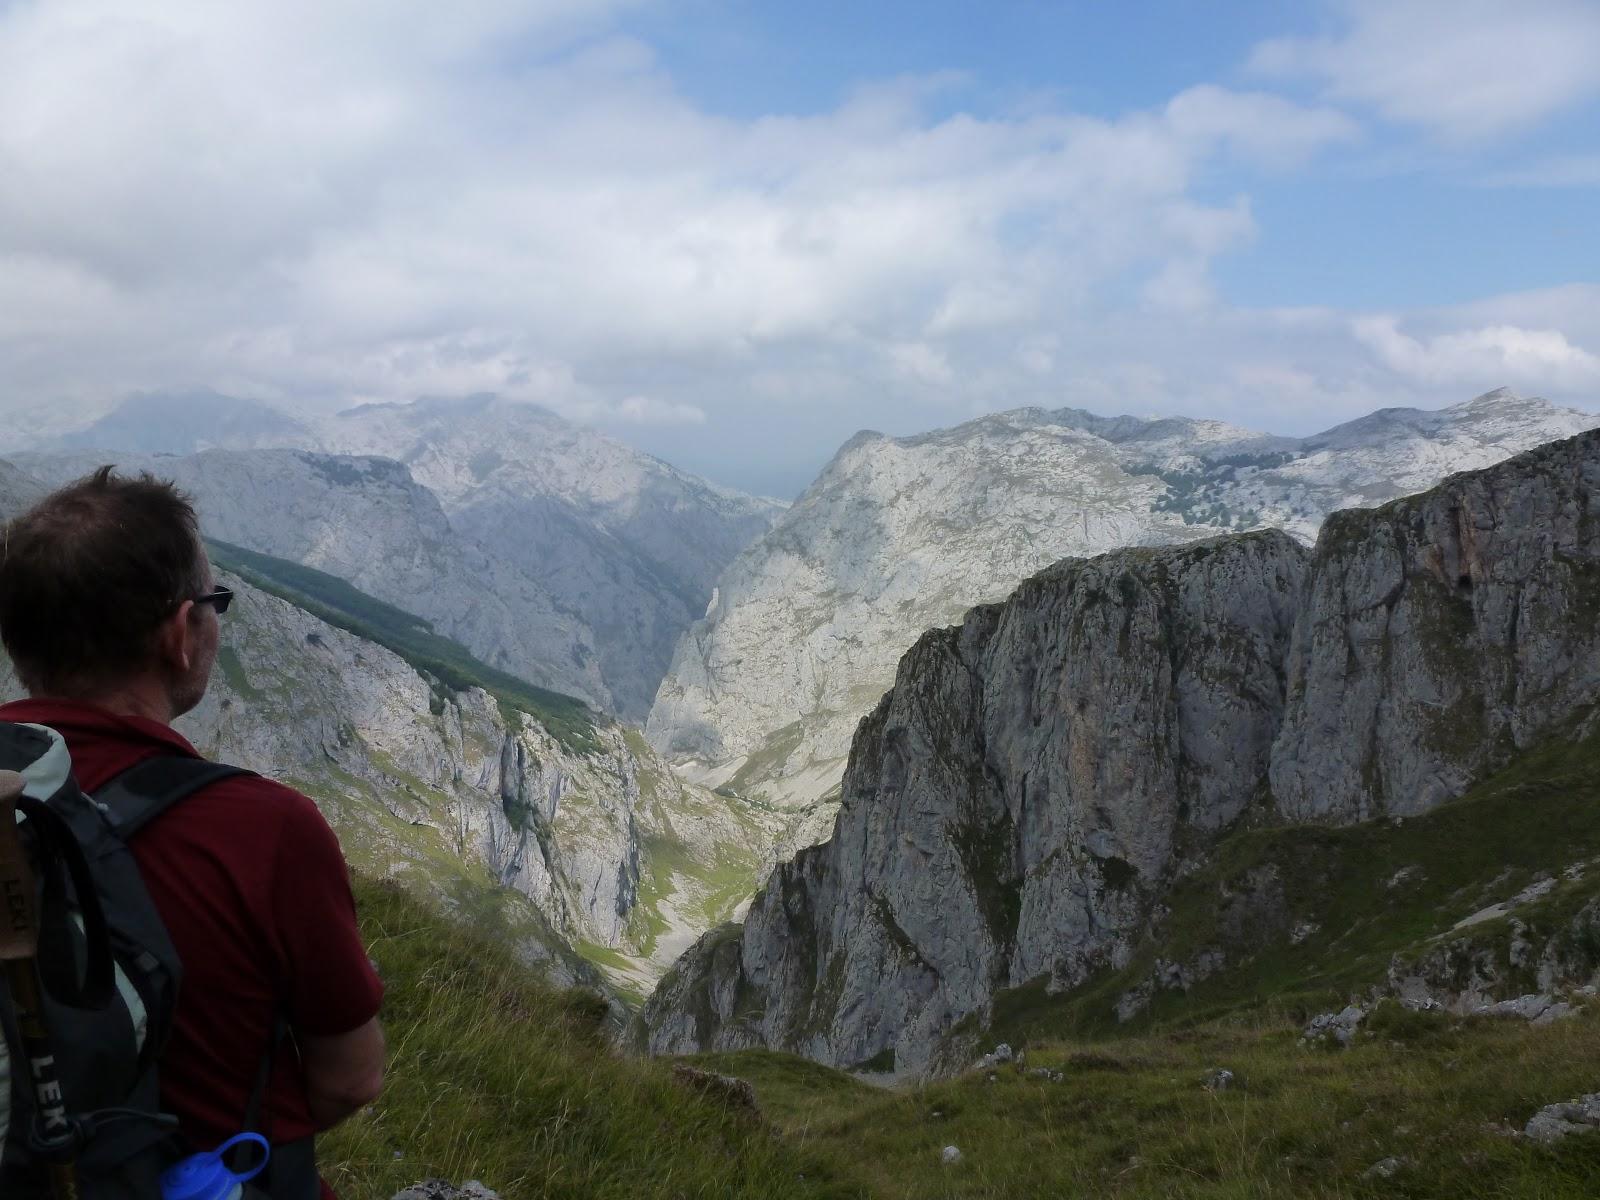 David admires view of mountains